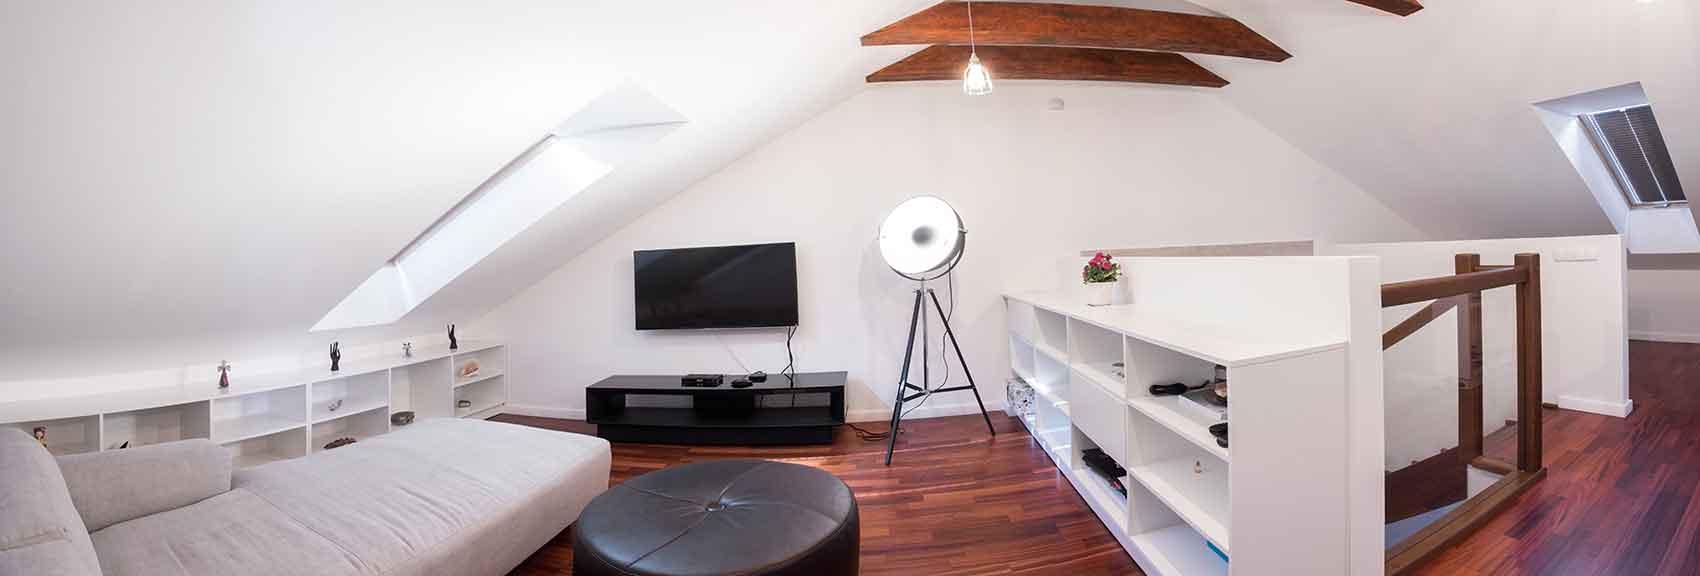 treppen preise angebote treppen mehr als angebote fotos preise seite 139 konzept. Black Bedroom Furniture Sets. Home Design Ideas